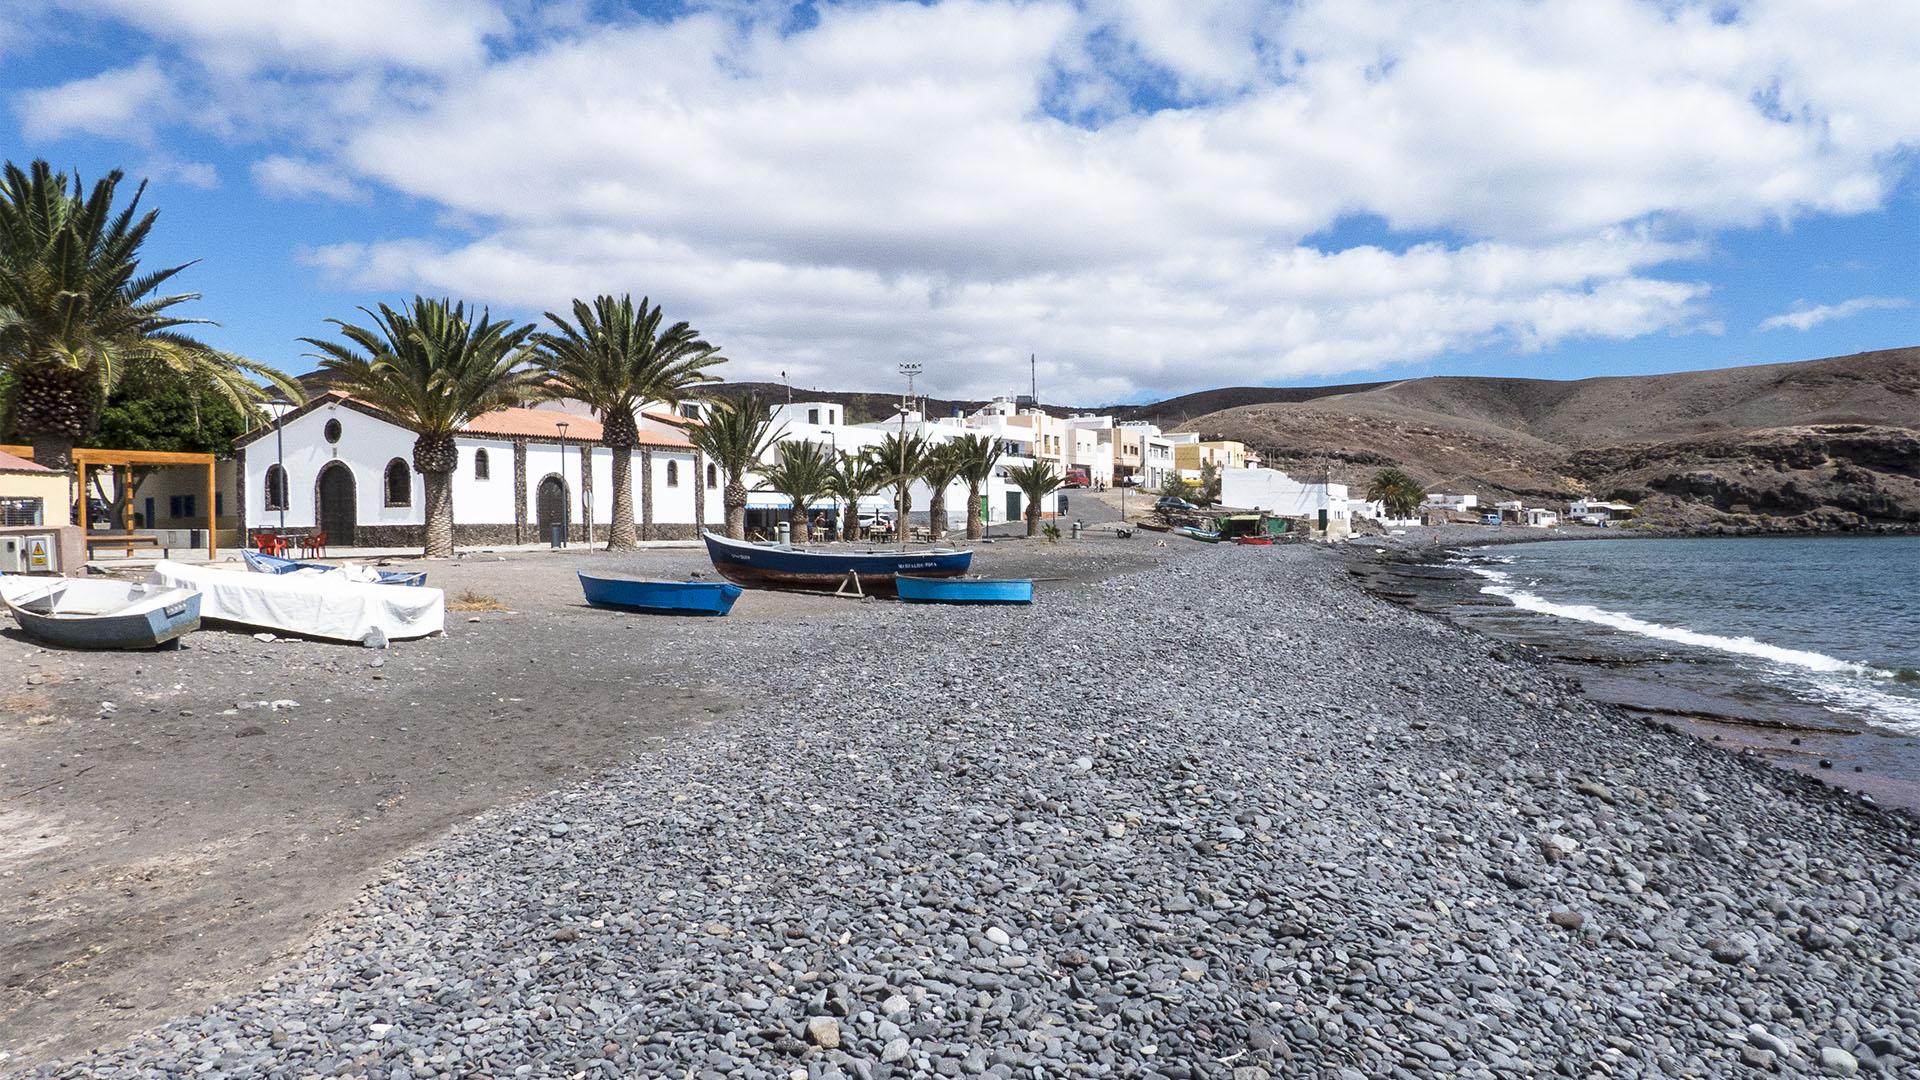 Die Strände Fuerteventuras: Playa la Lajita.